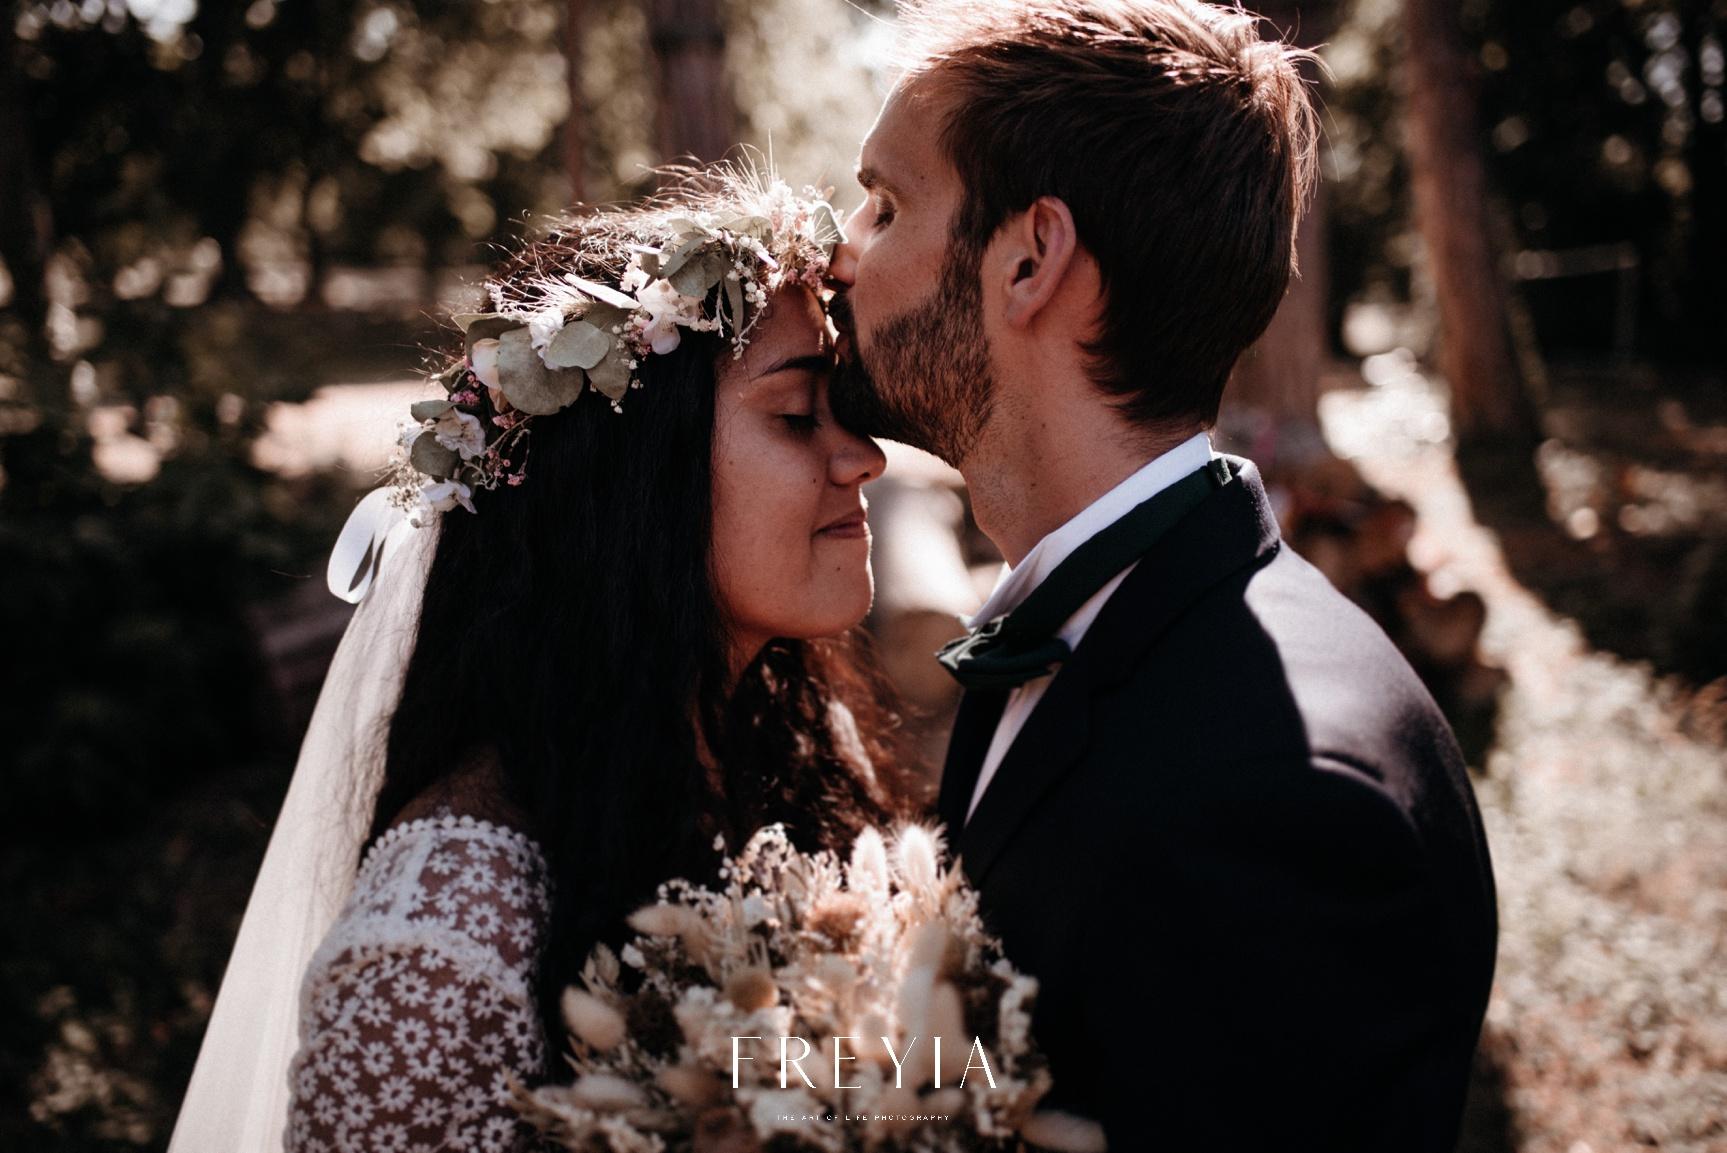 R + T |  mariage reportage alternatif moody intime minimaliste vintage naturel boho boheme |  PHOTOGRAPHE mariage PARIS france destination  | FREYIA photography_-220.jpg